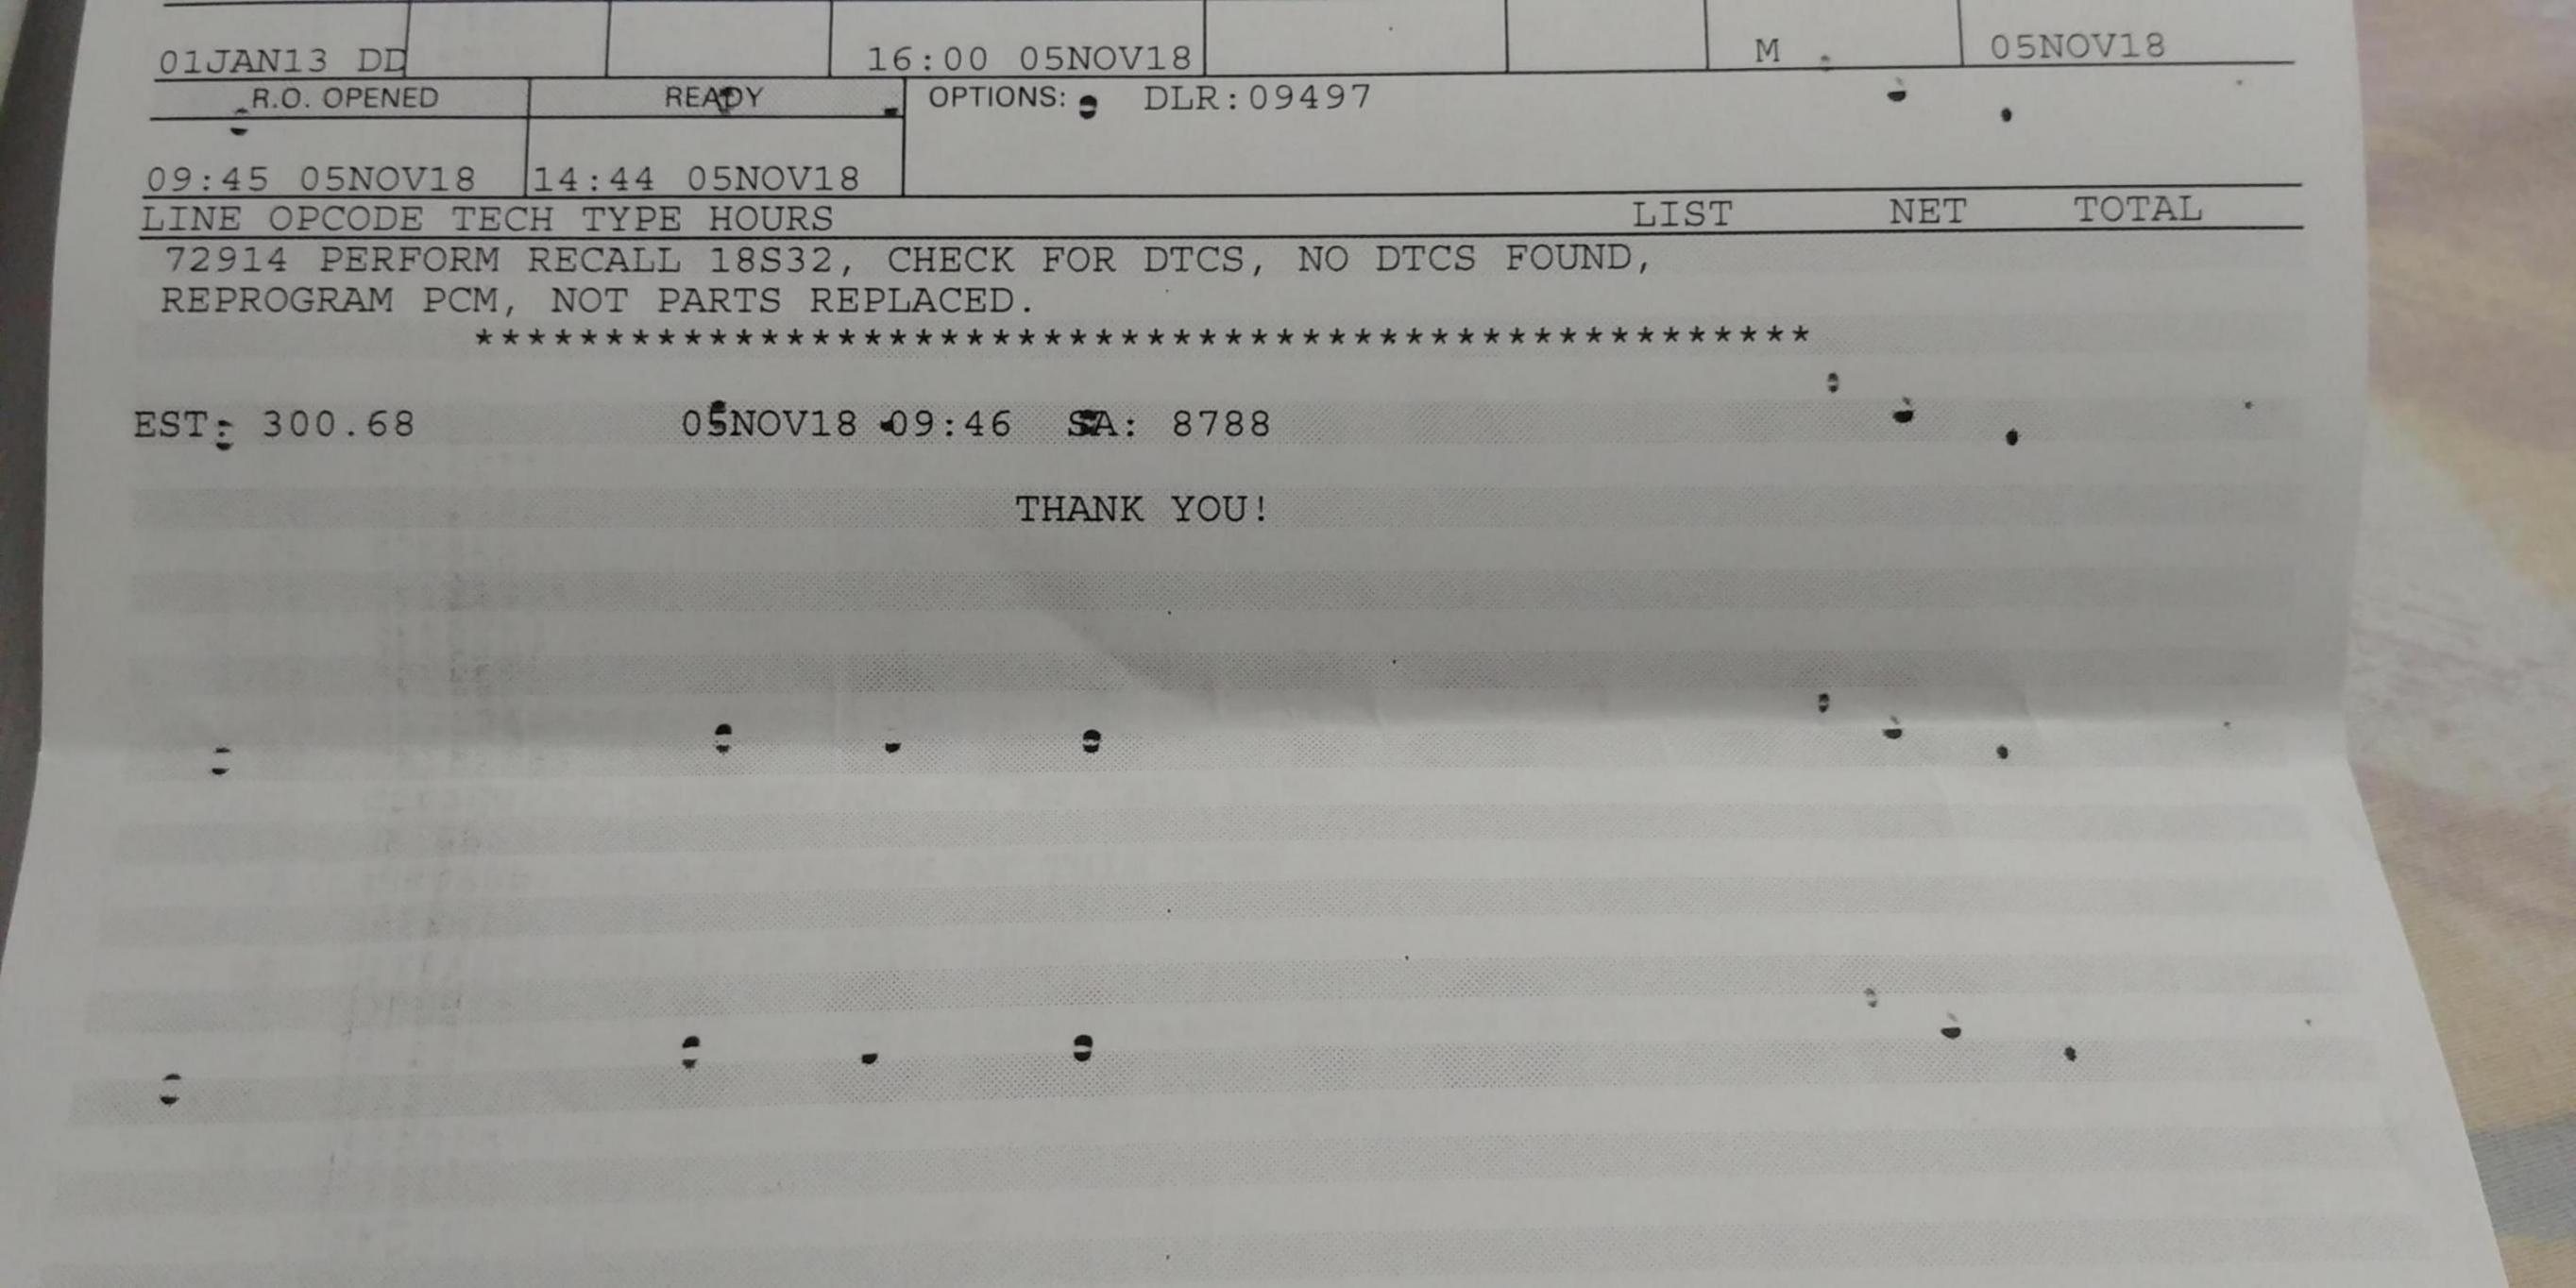 2012-18 Recall - Stall / Tank Deform-20181105_203726_1541468472039.jpg